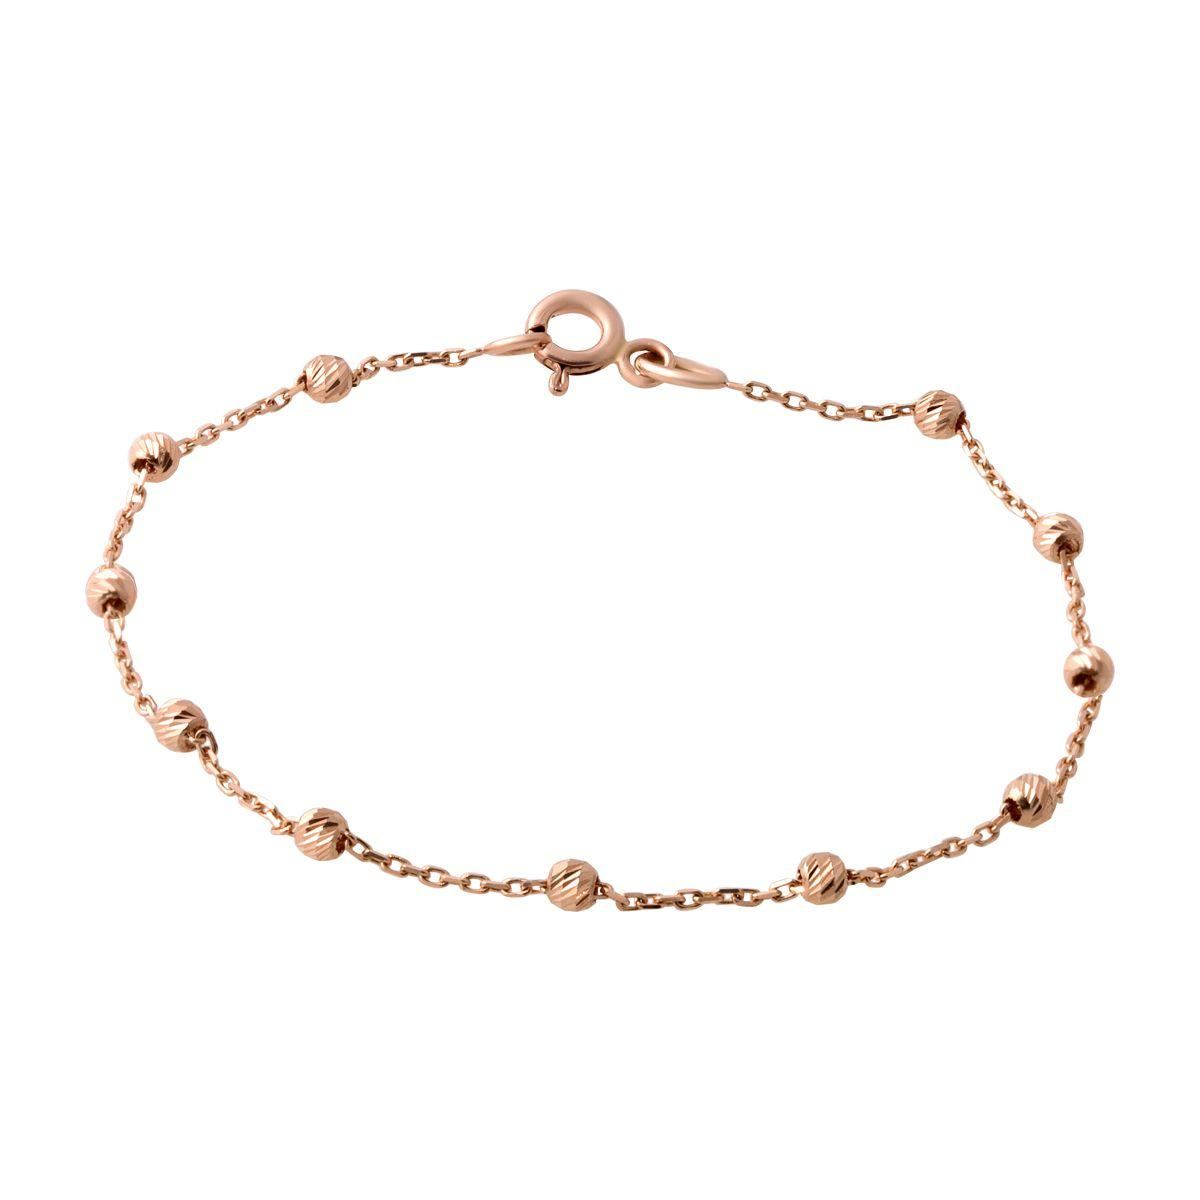 Золотой браслет DreamJewelry без камней (2066026) 18 размер